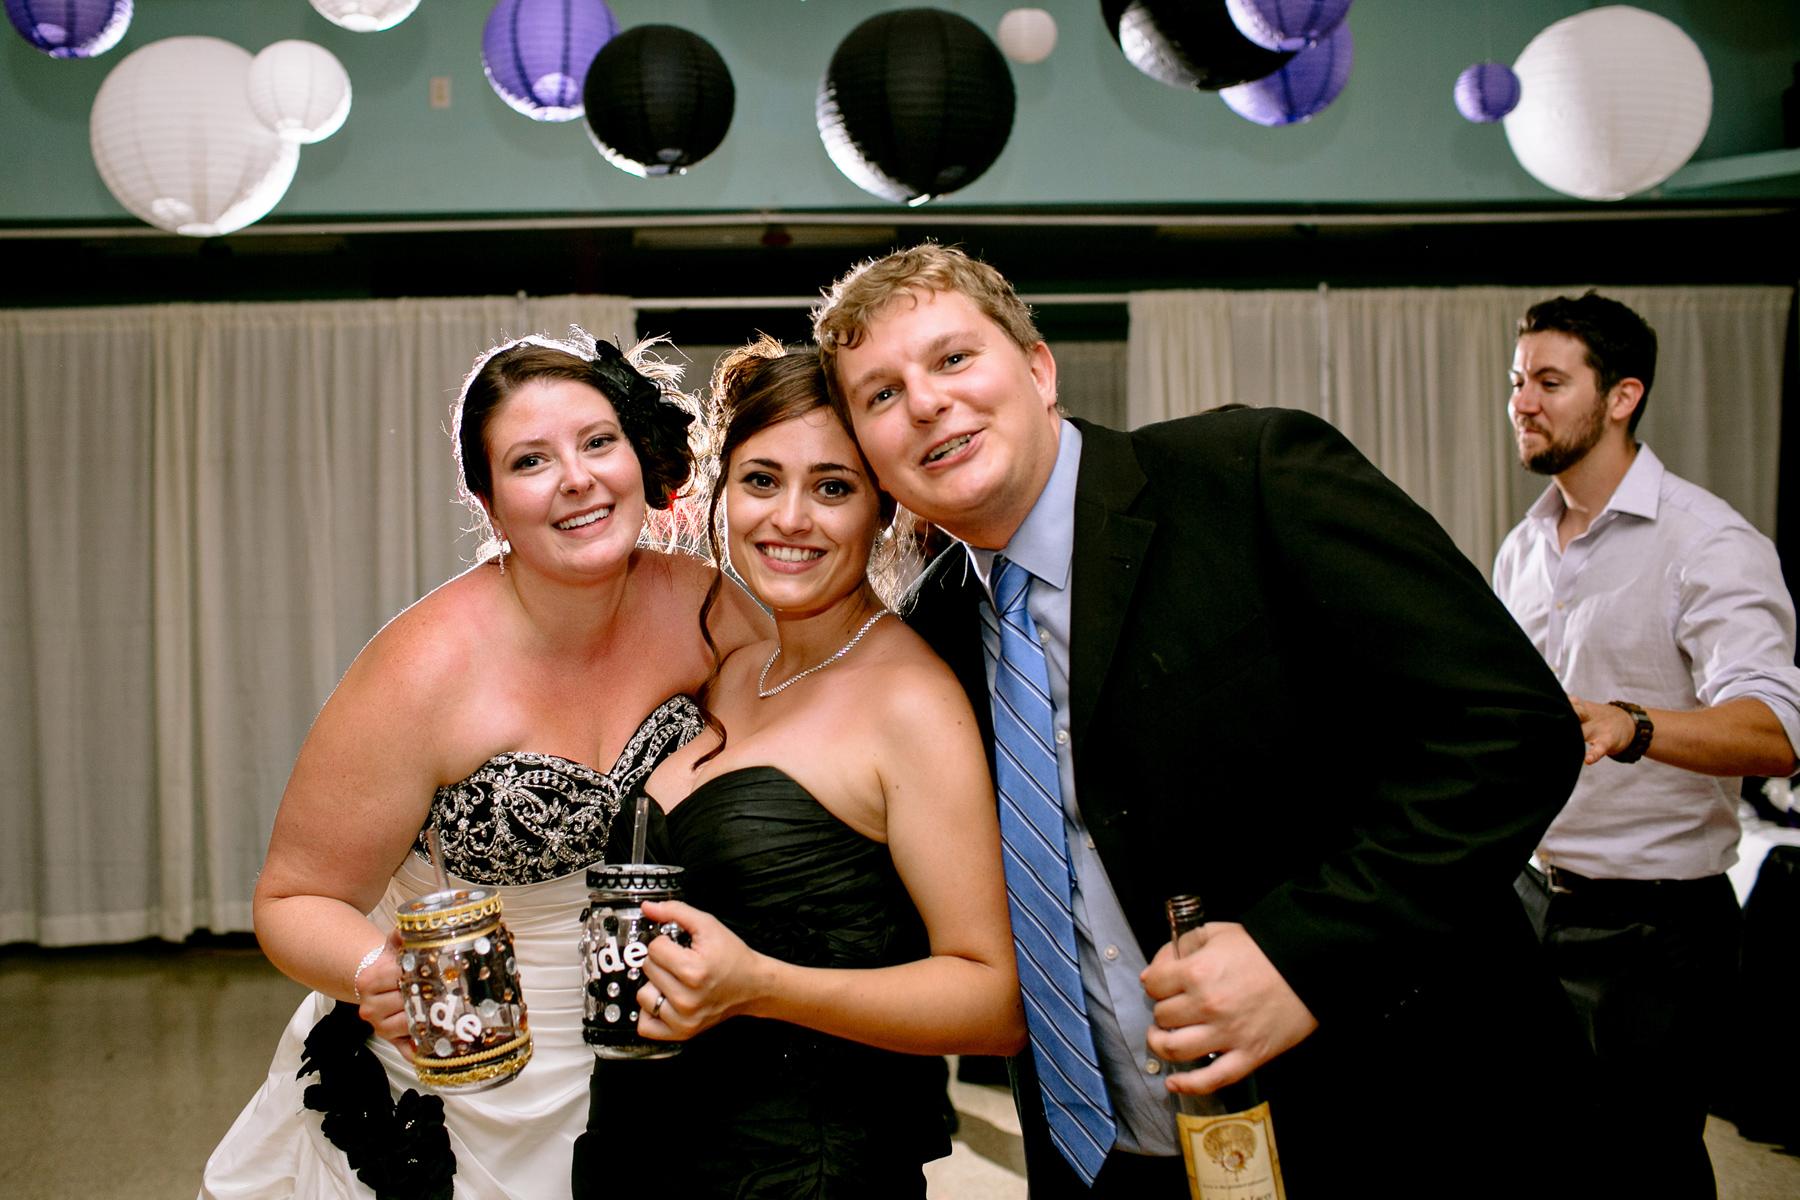 088-awesome-joggins-fossil-wedding-nova-scotia-kandisebrown-jl2016